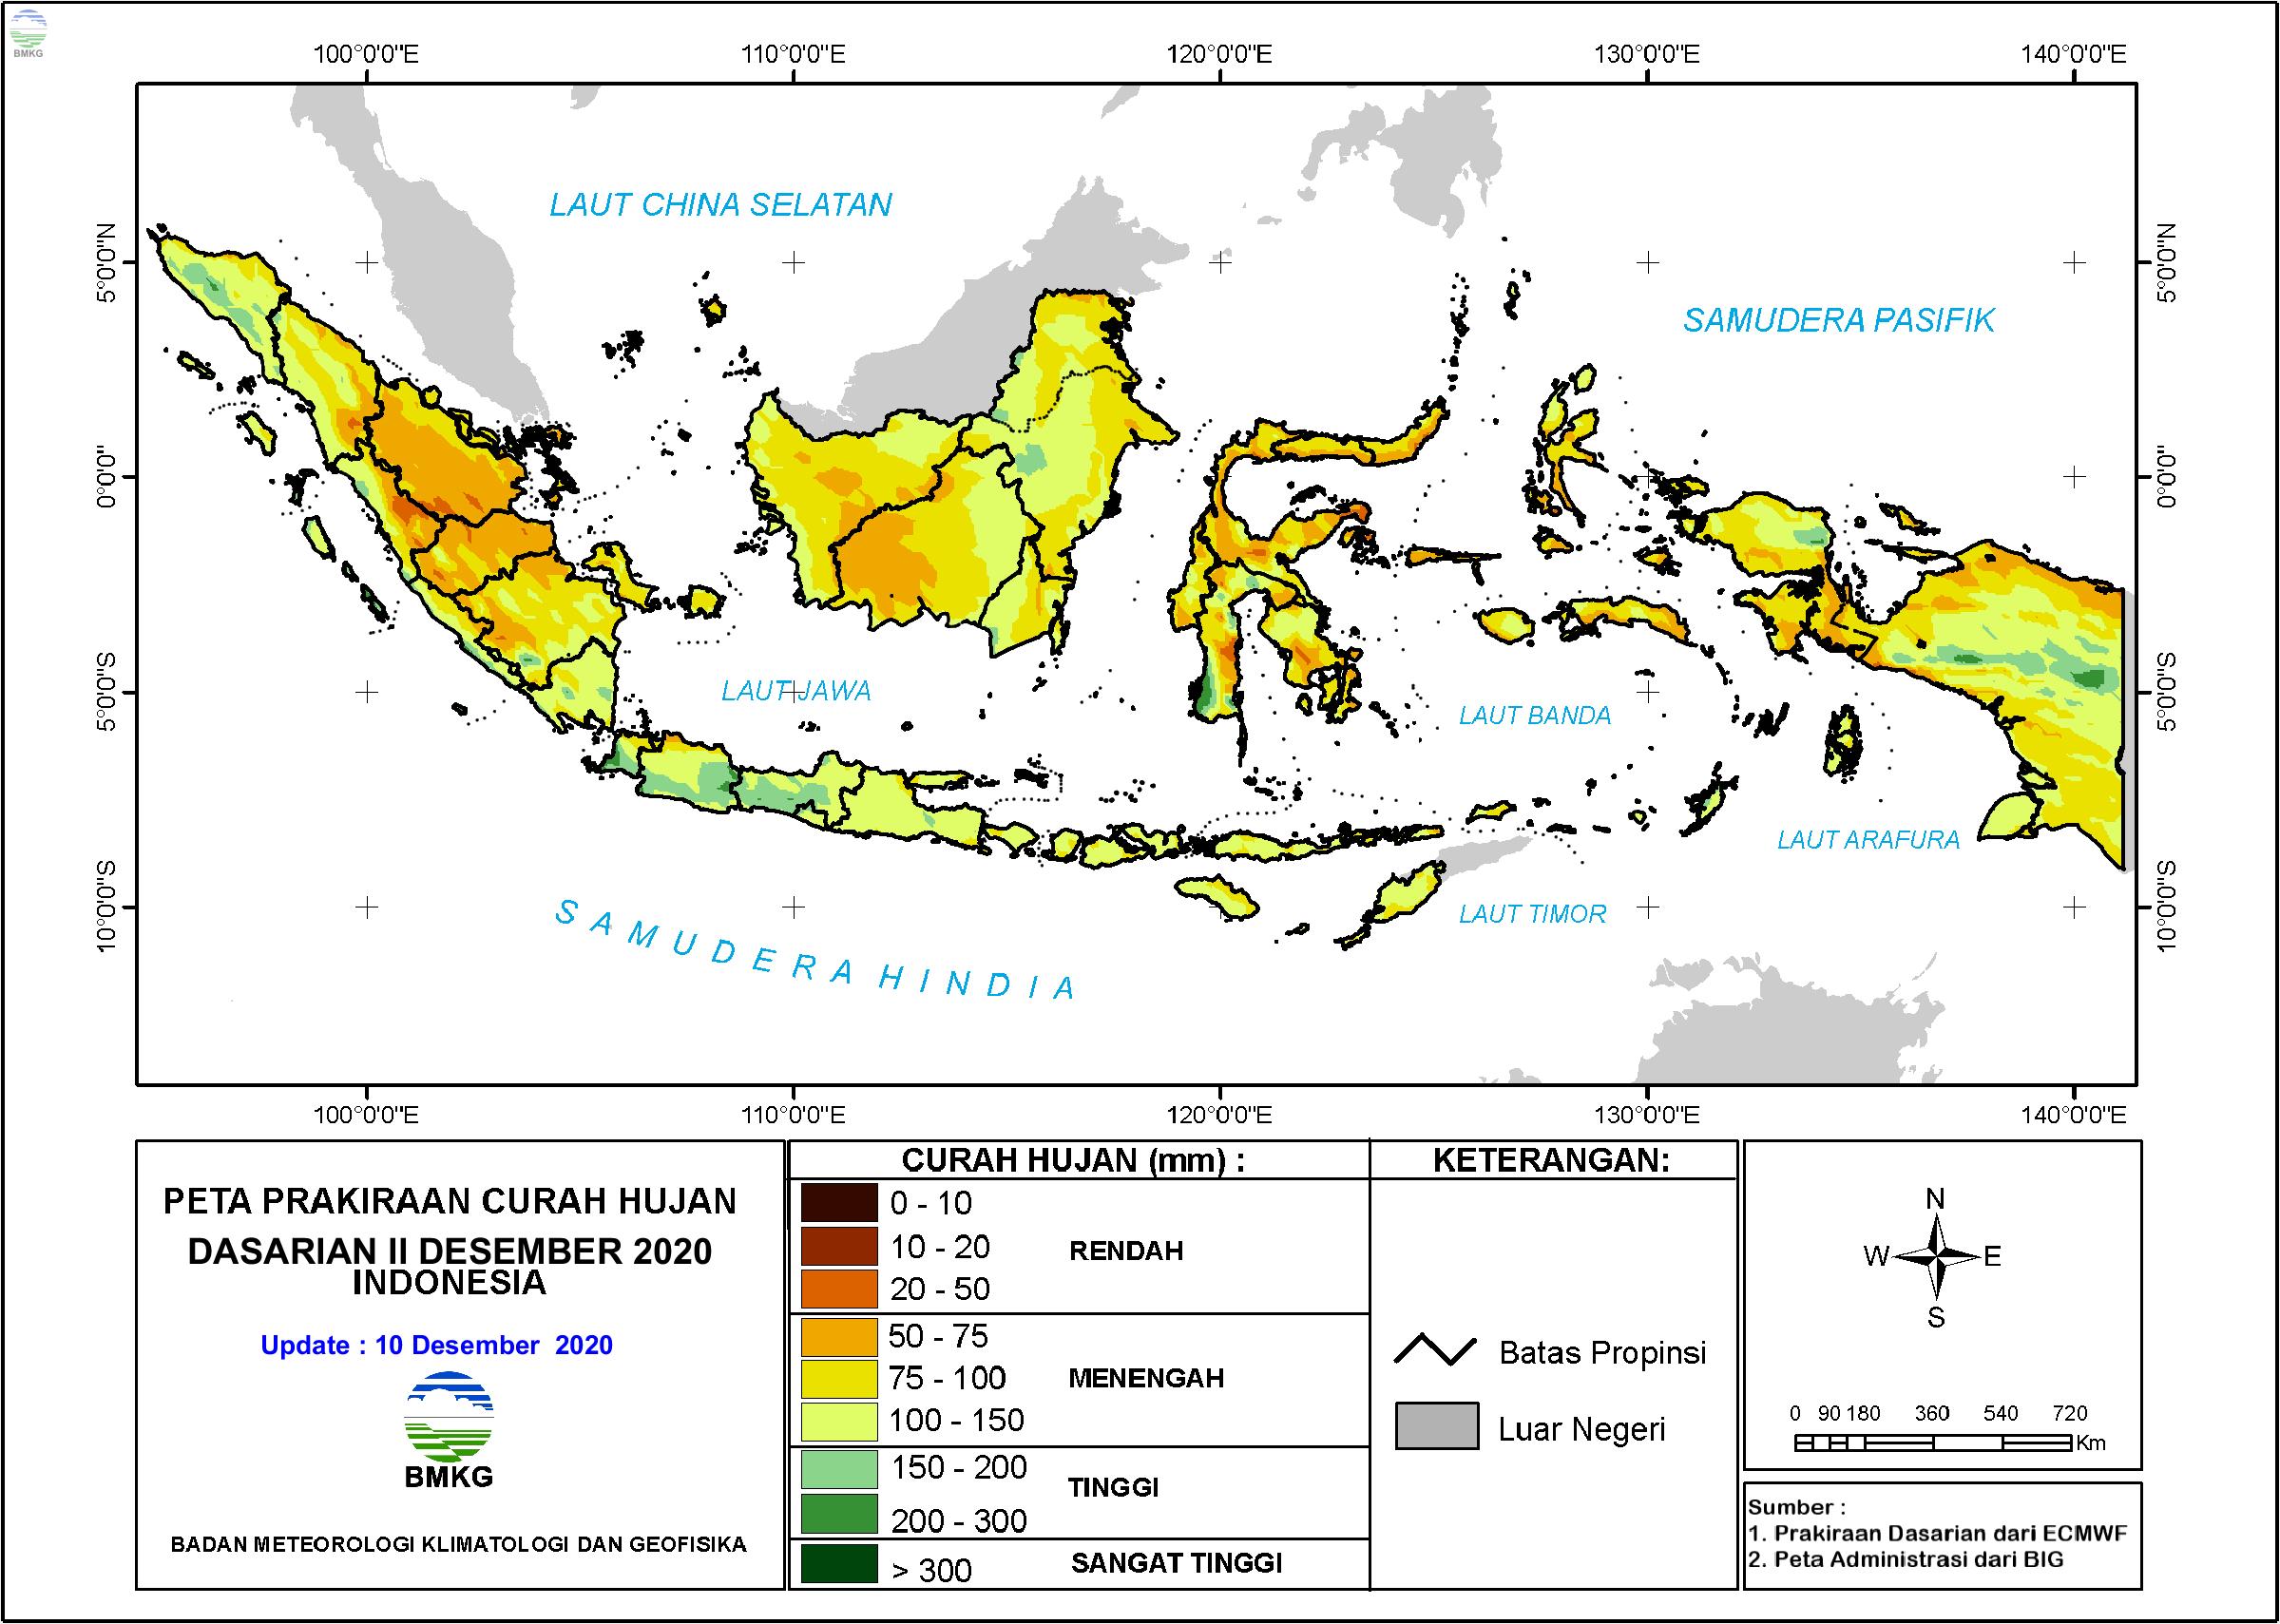 Prakiraan Curah Hujan Dasarian II-III Desember 2020 dan I Januari 2021